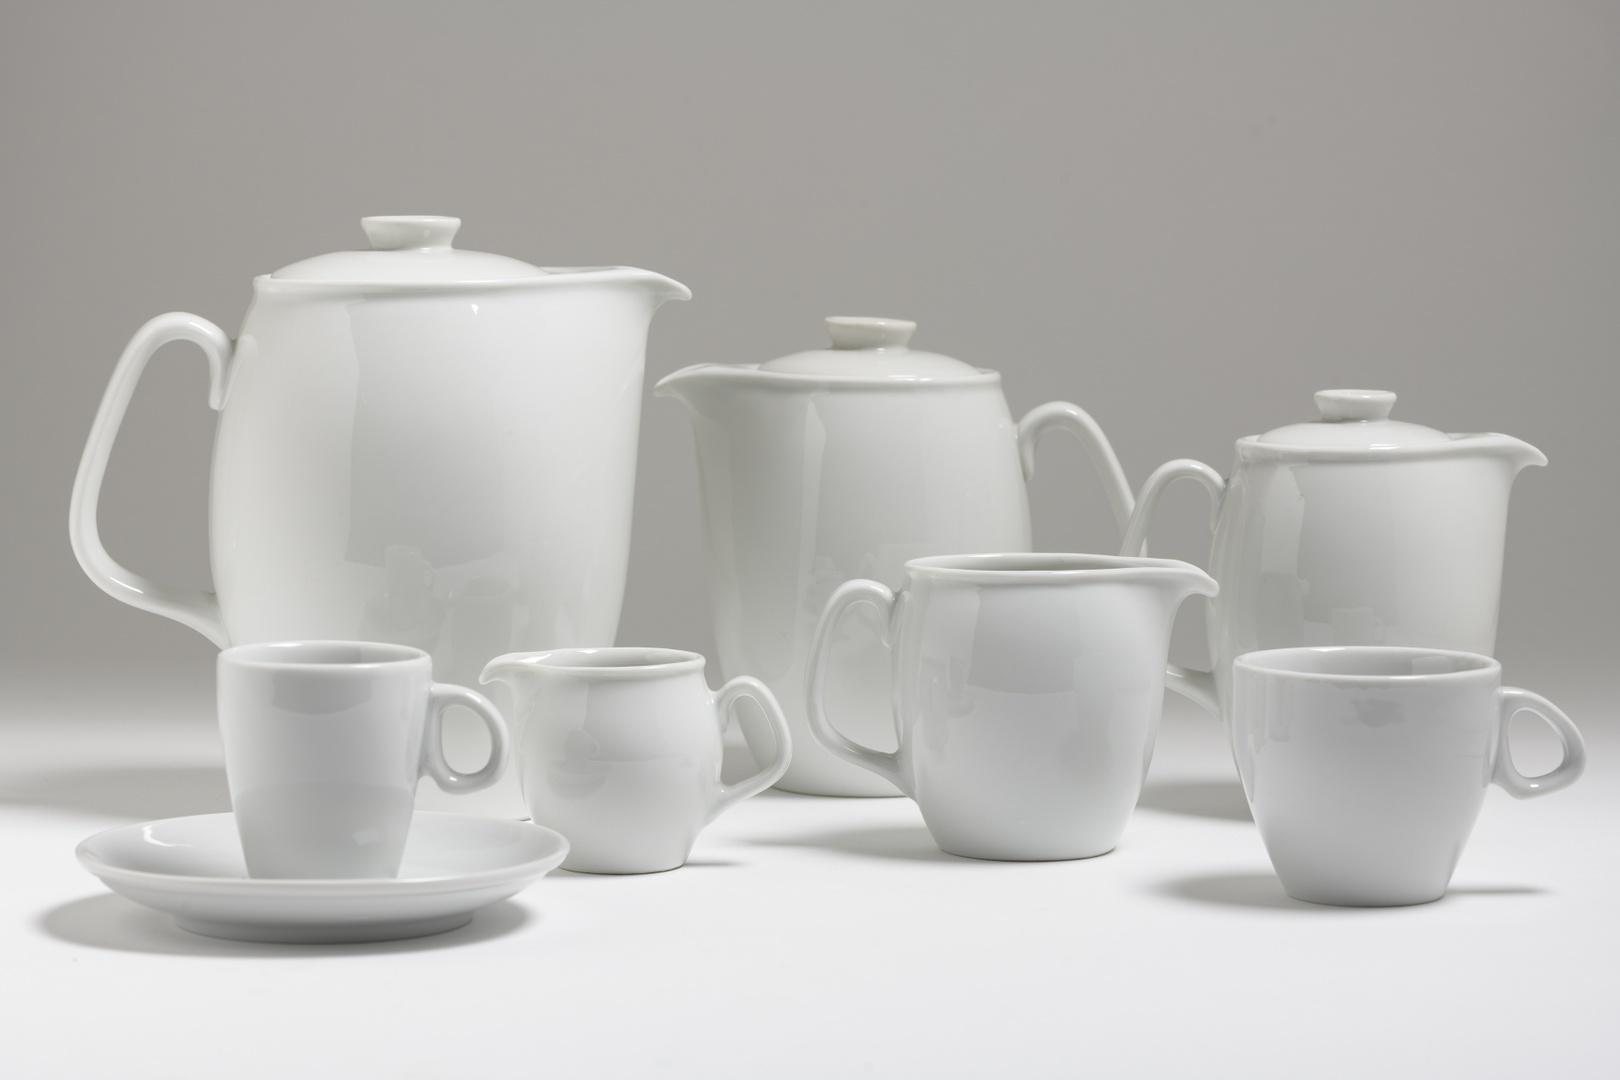 Hotelservies: 3 koffiekannen met deksel, 2 melkkannen, koffiekop met schotel, theekop met schotel